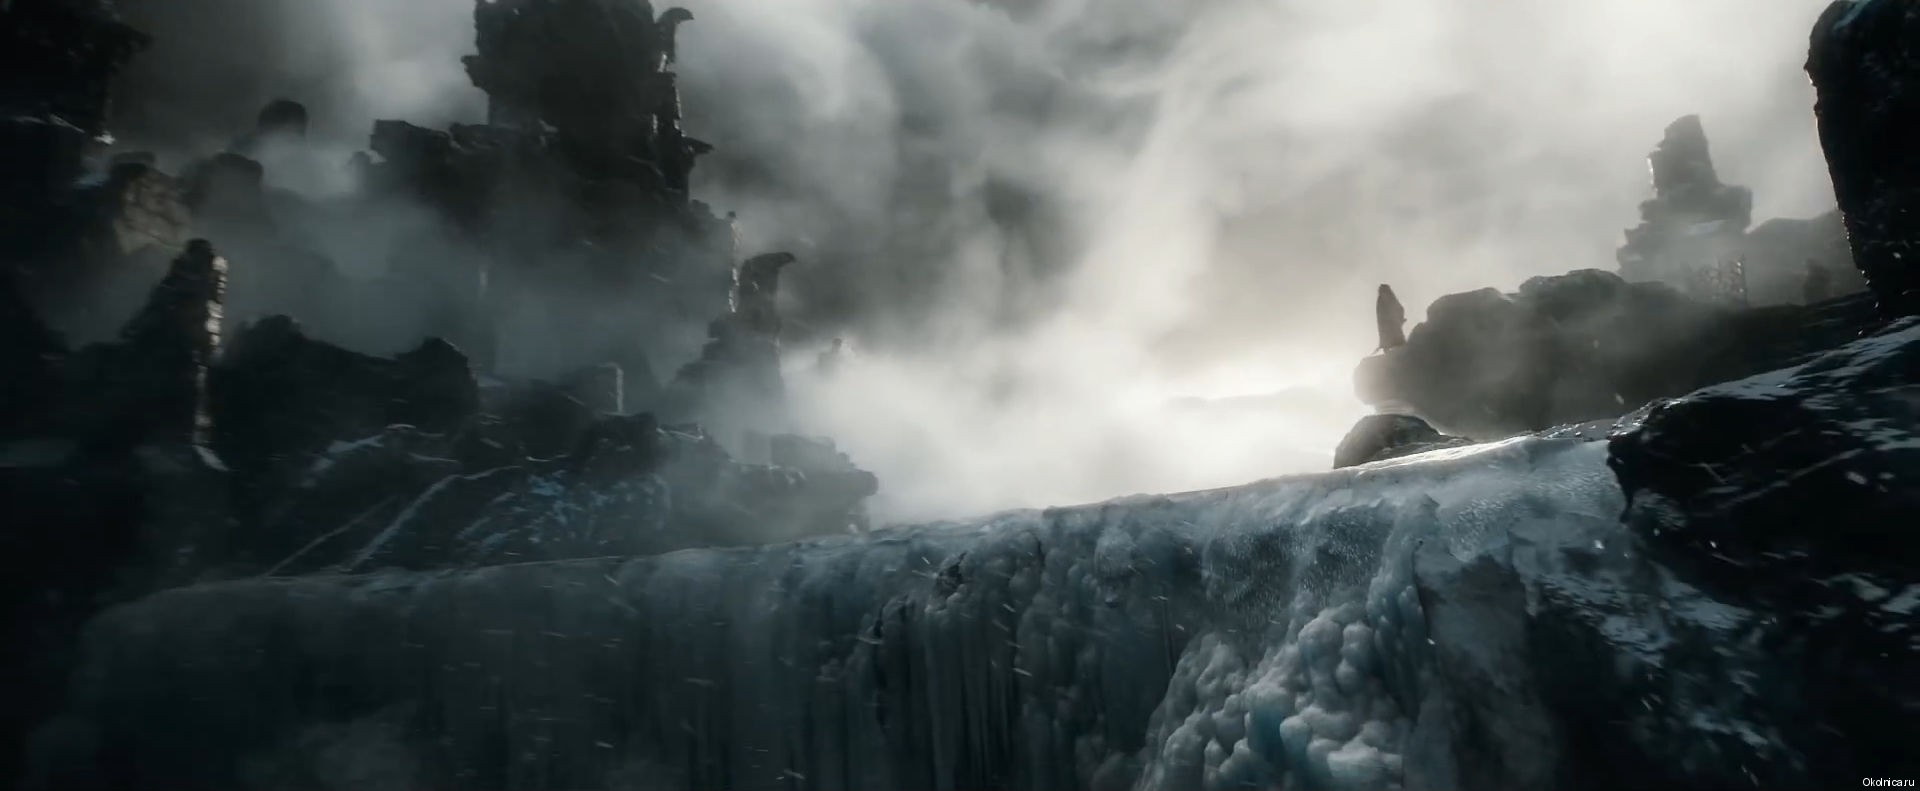 Kino_Hobbit_Bitva_pyati_voinstv_56